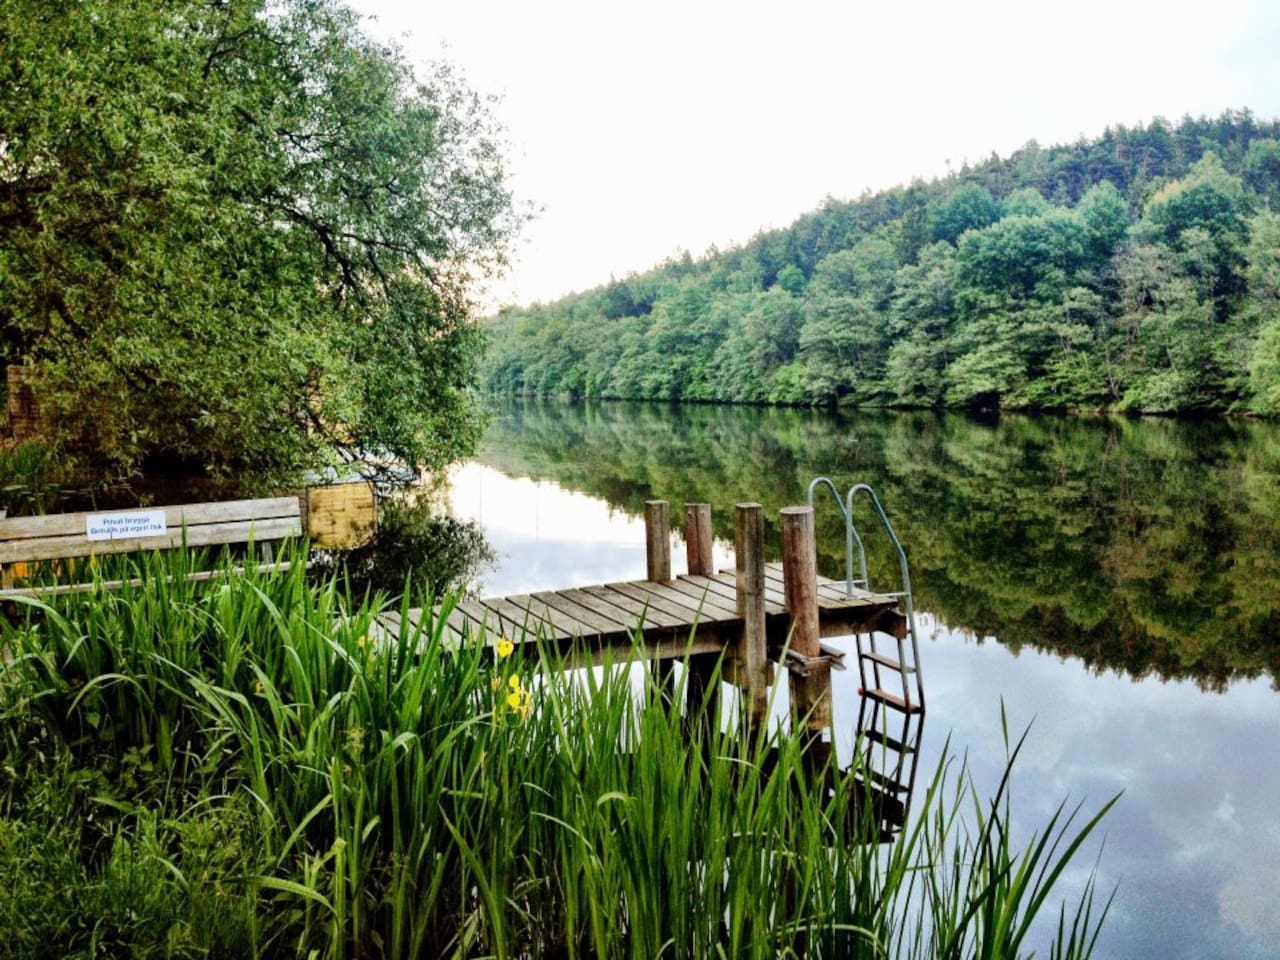 20 steps from apt to a mornig swim